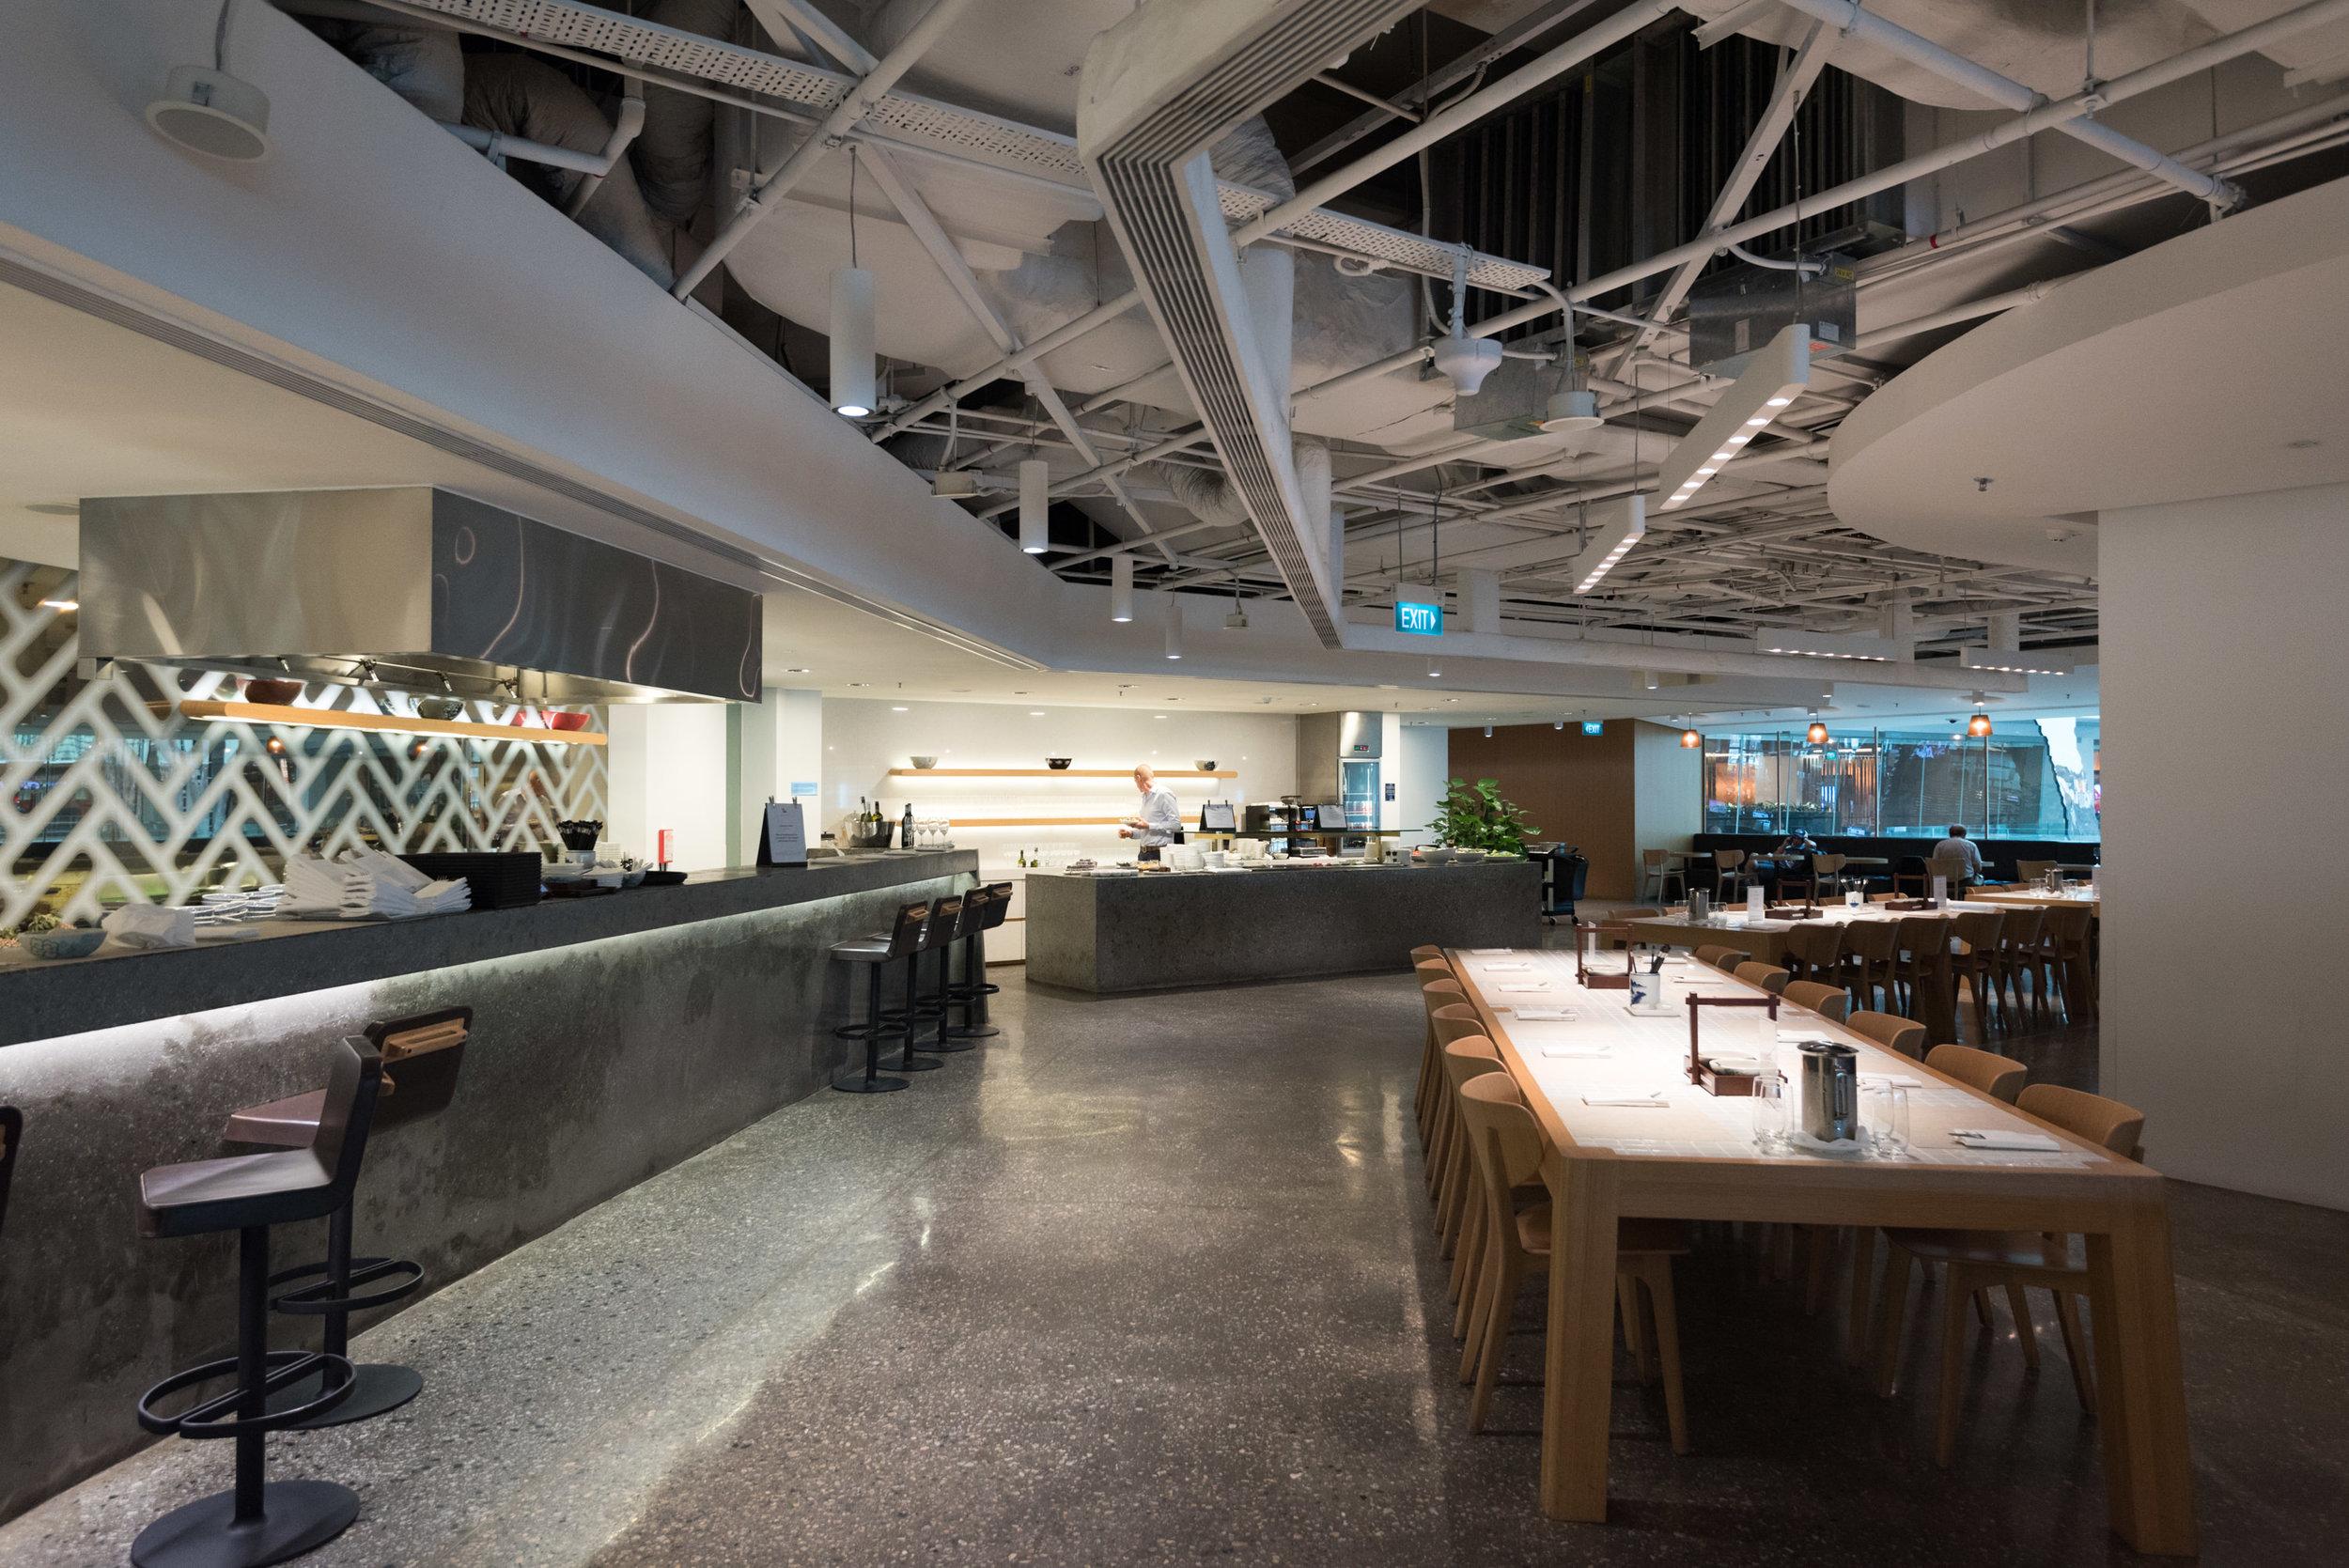 The Qantas Lounge - Singapore Changi Airport (SIN)